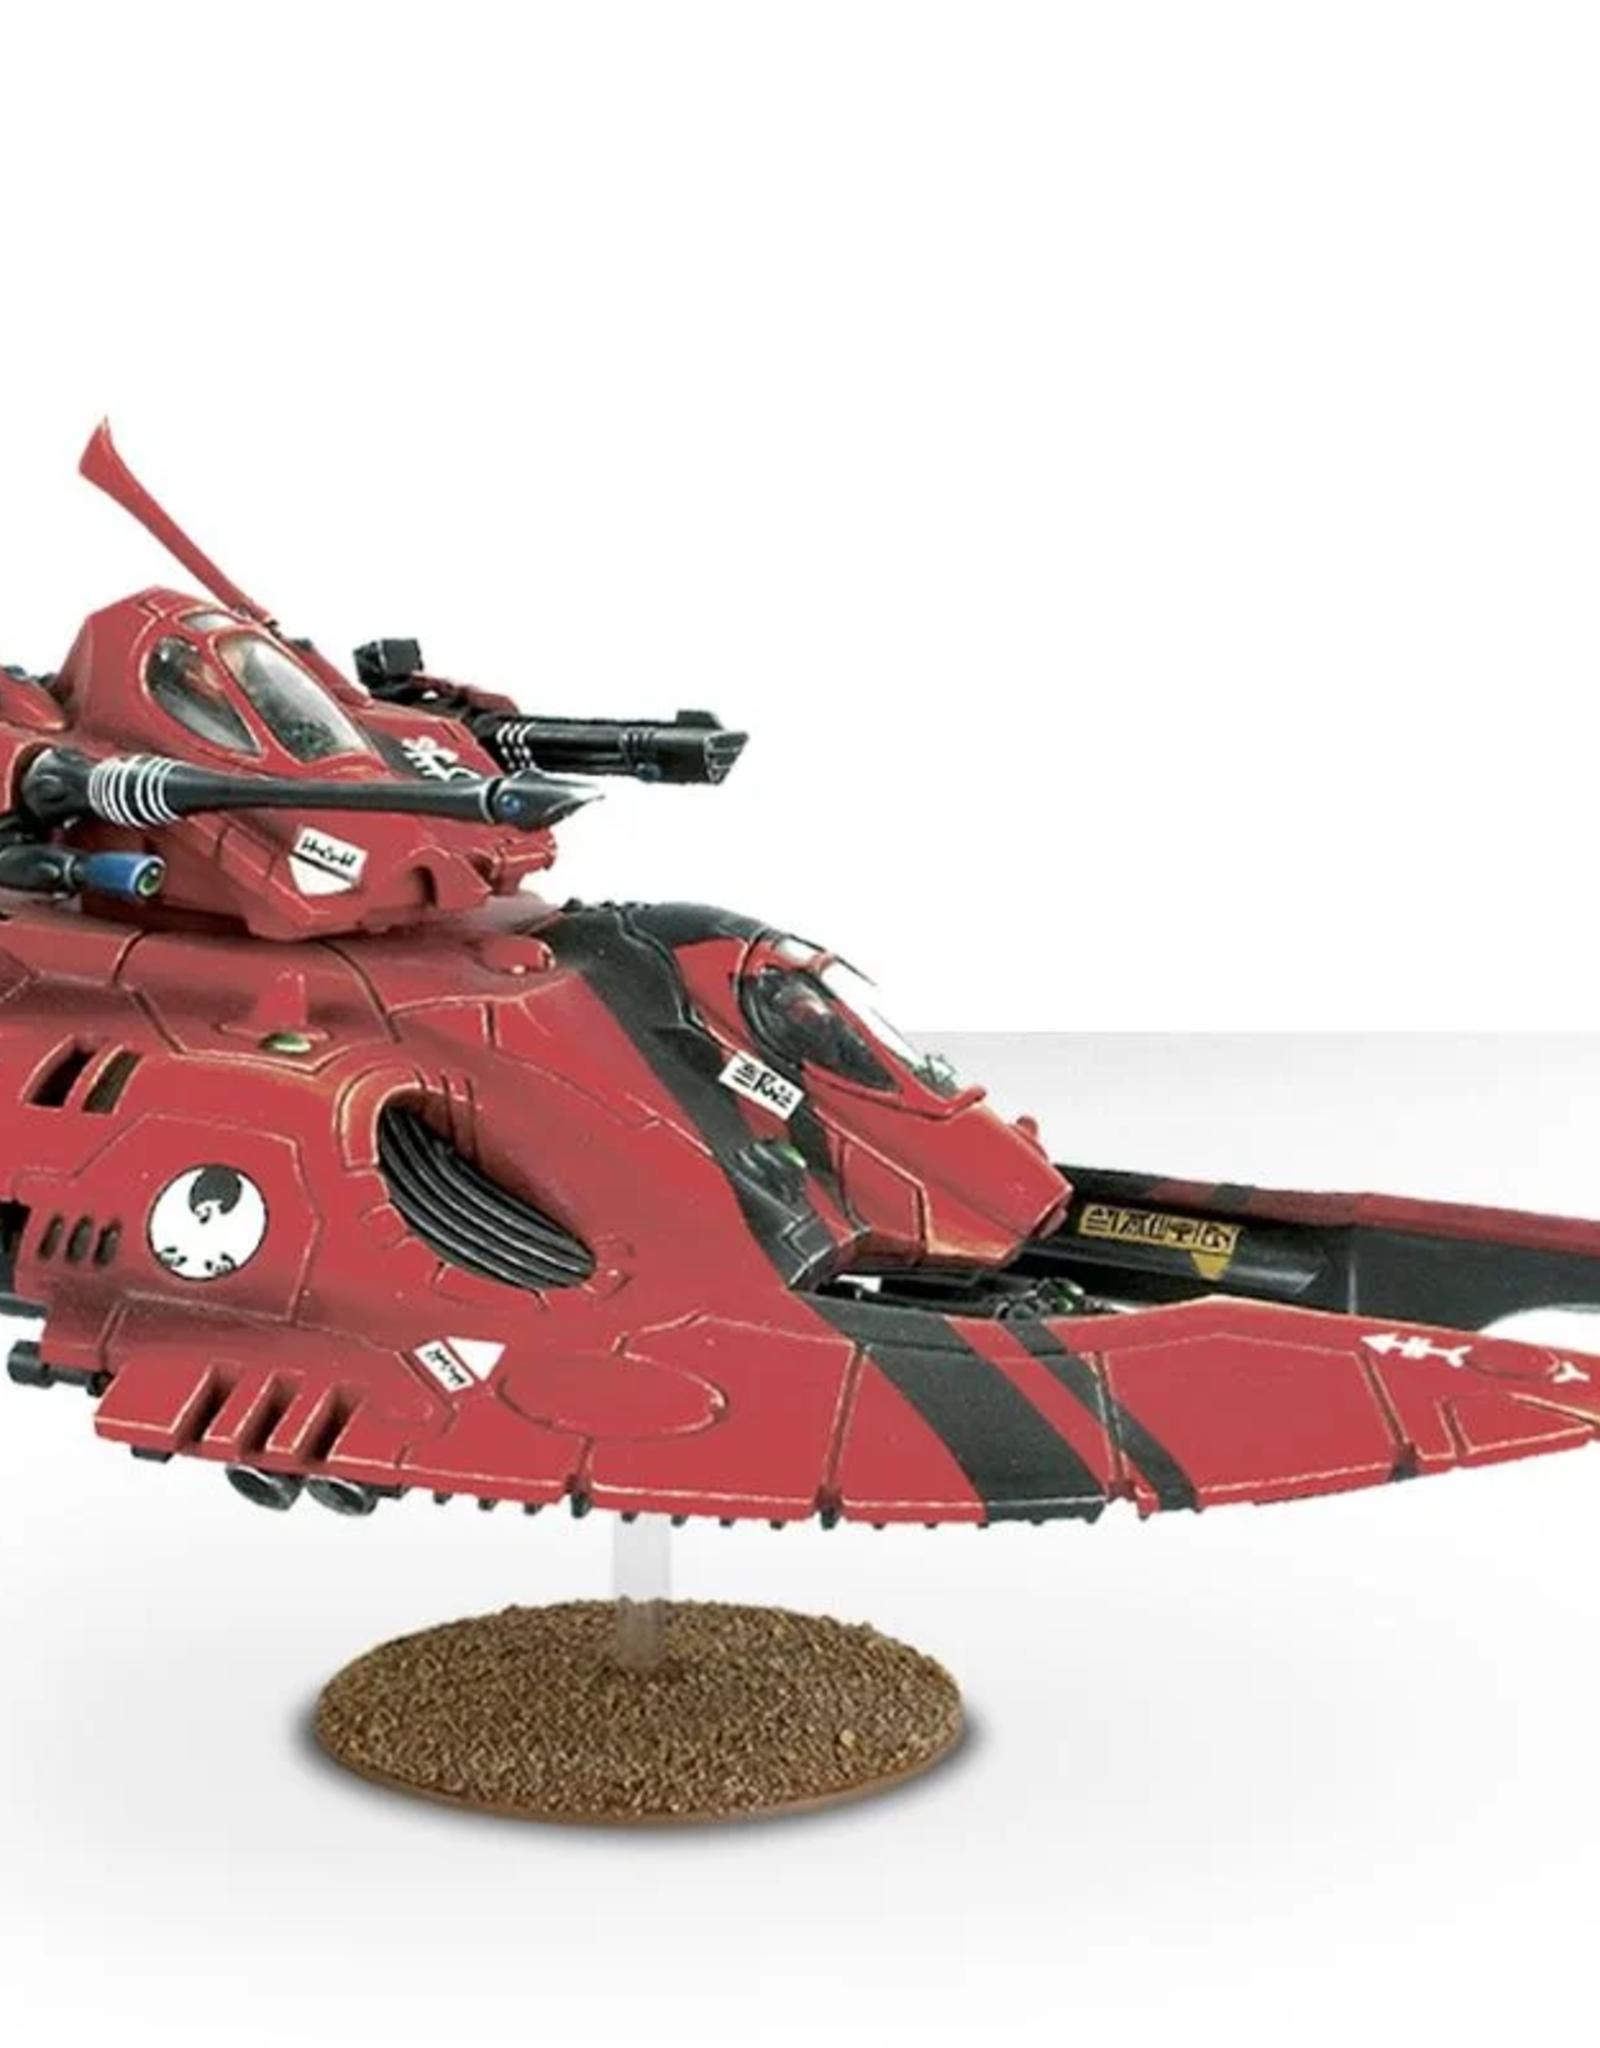 Games Workshop Craftworld: Falcon Grav Tank